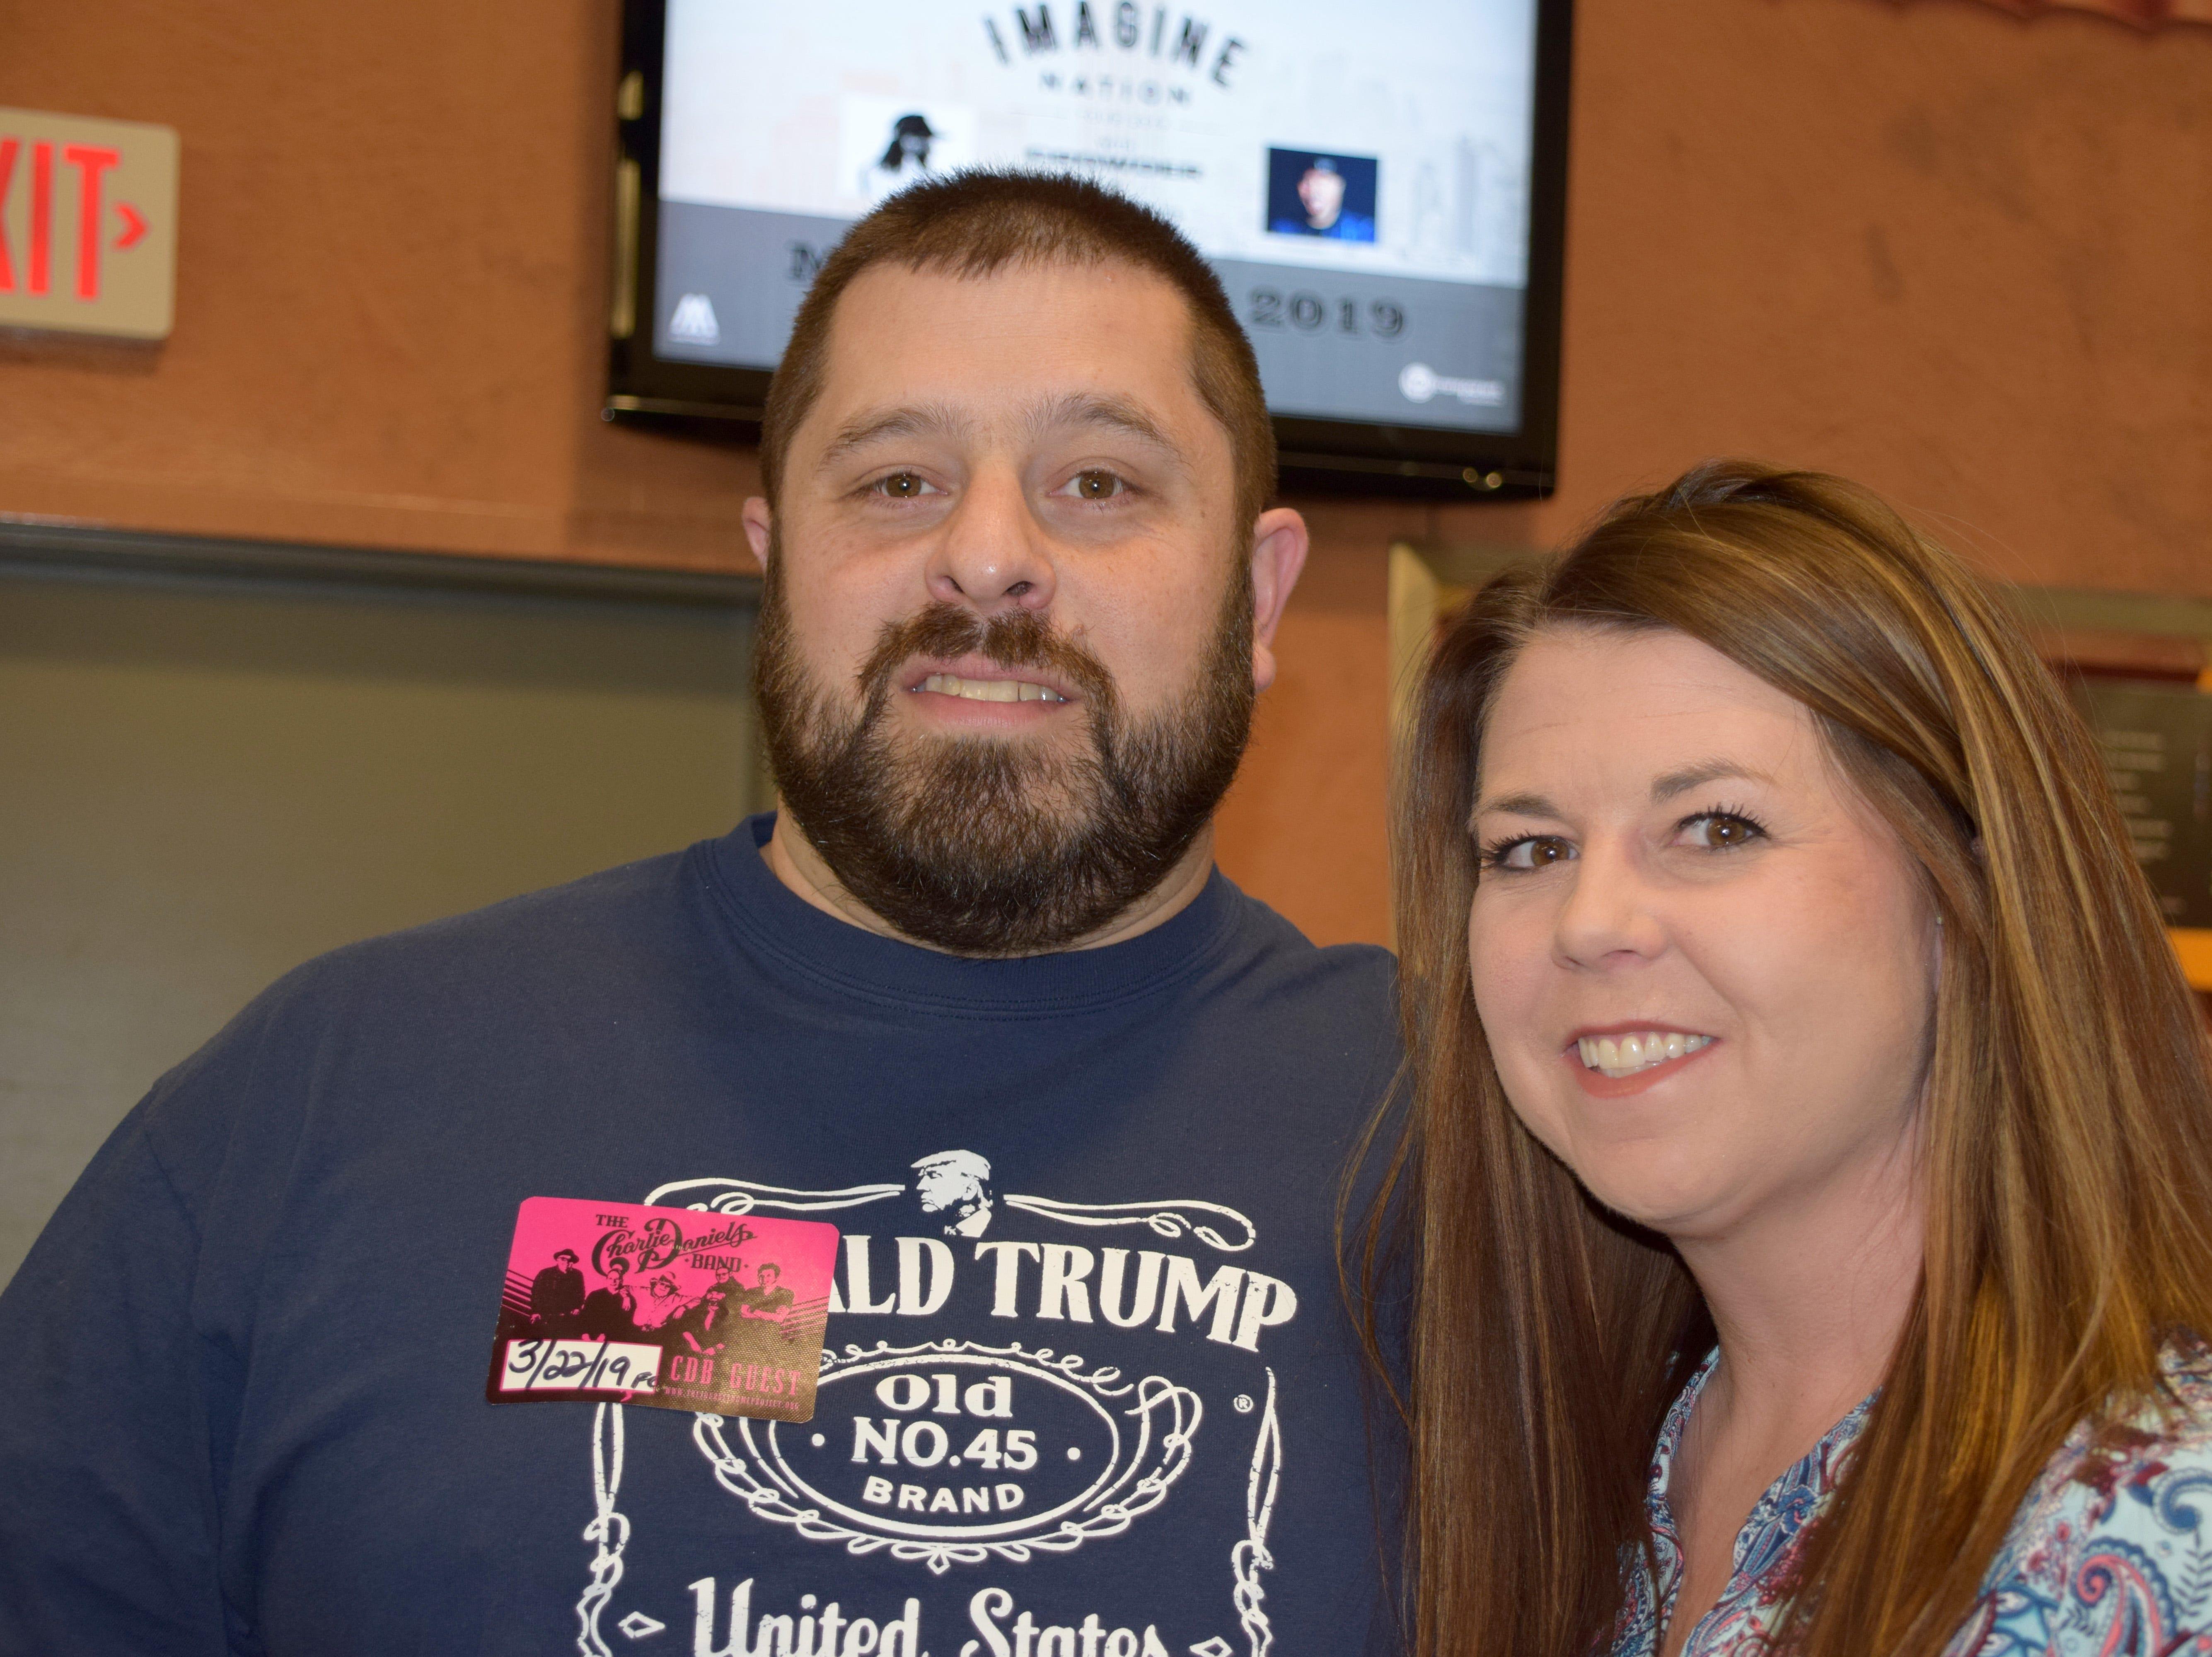 Brandon Peterson and Heidi Simpkins